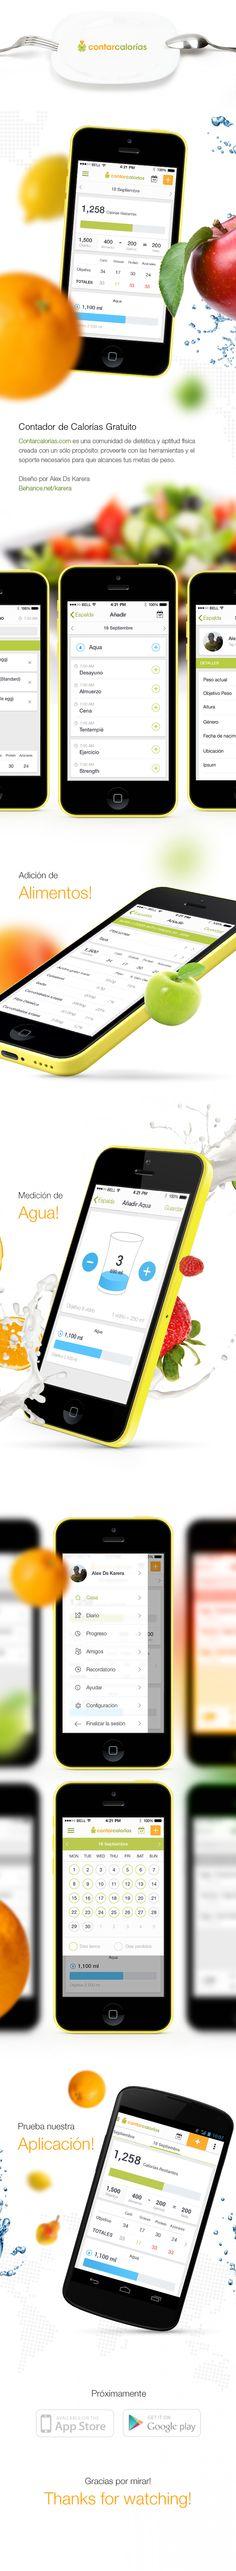 Contar calorias. Fitness application (iOS & Android) by Alex Ds Karera, via Behance